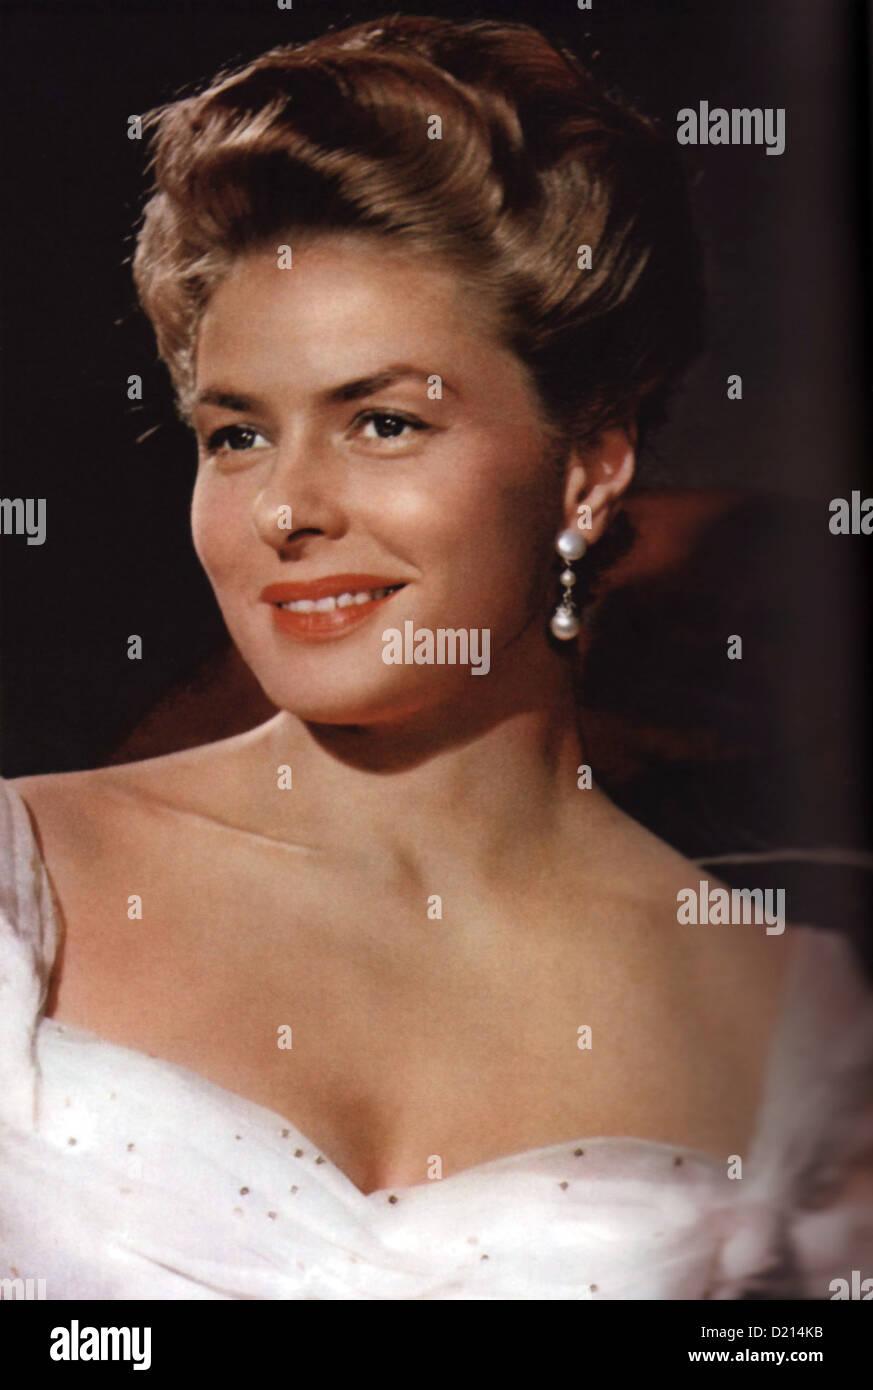 ELENA AND HER MEN (Elena et les hommes) 1956 Warner Bros film with Ingrid Bergman - Stock Image